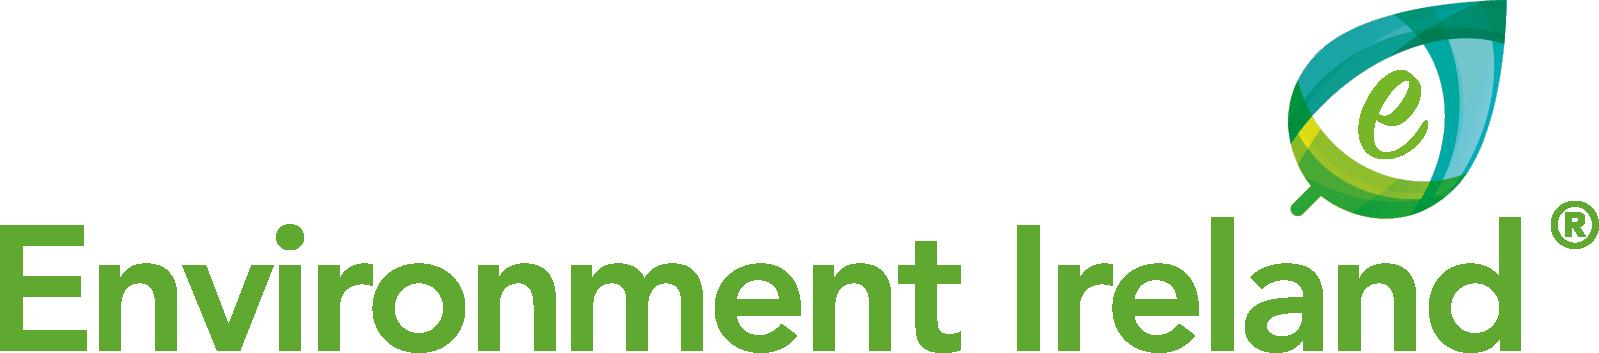 Environment Ireland – Environment Ireland